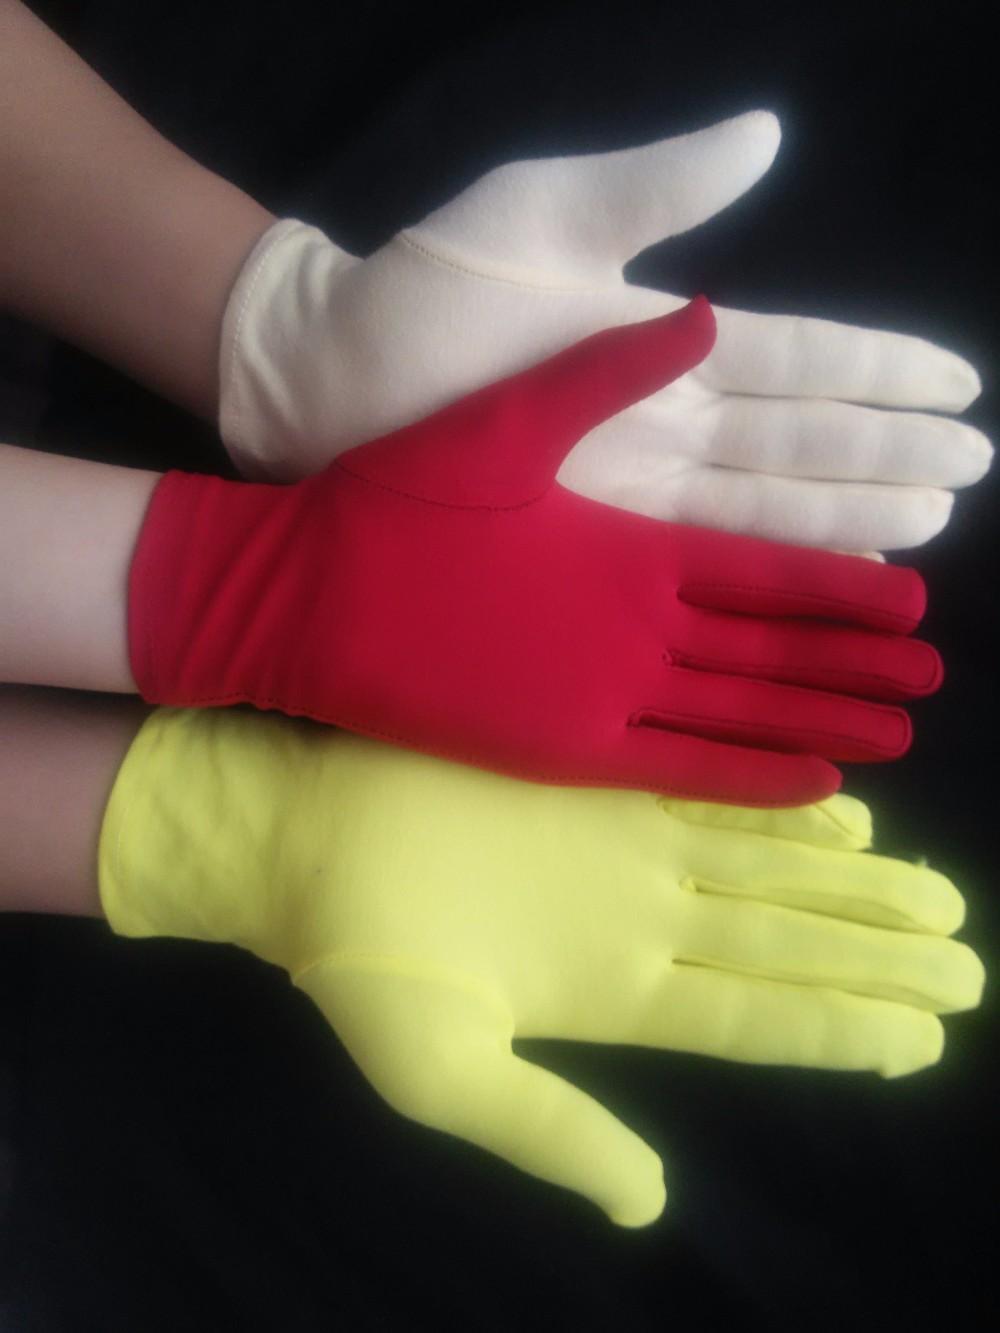 Long Wrist White Cotton Gloves USA Sizes M-XXL Marching Band,Military,Santa